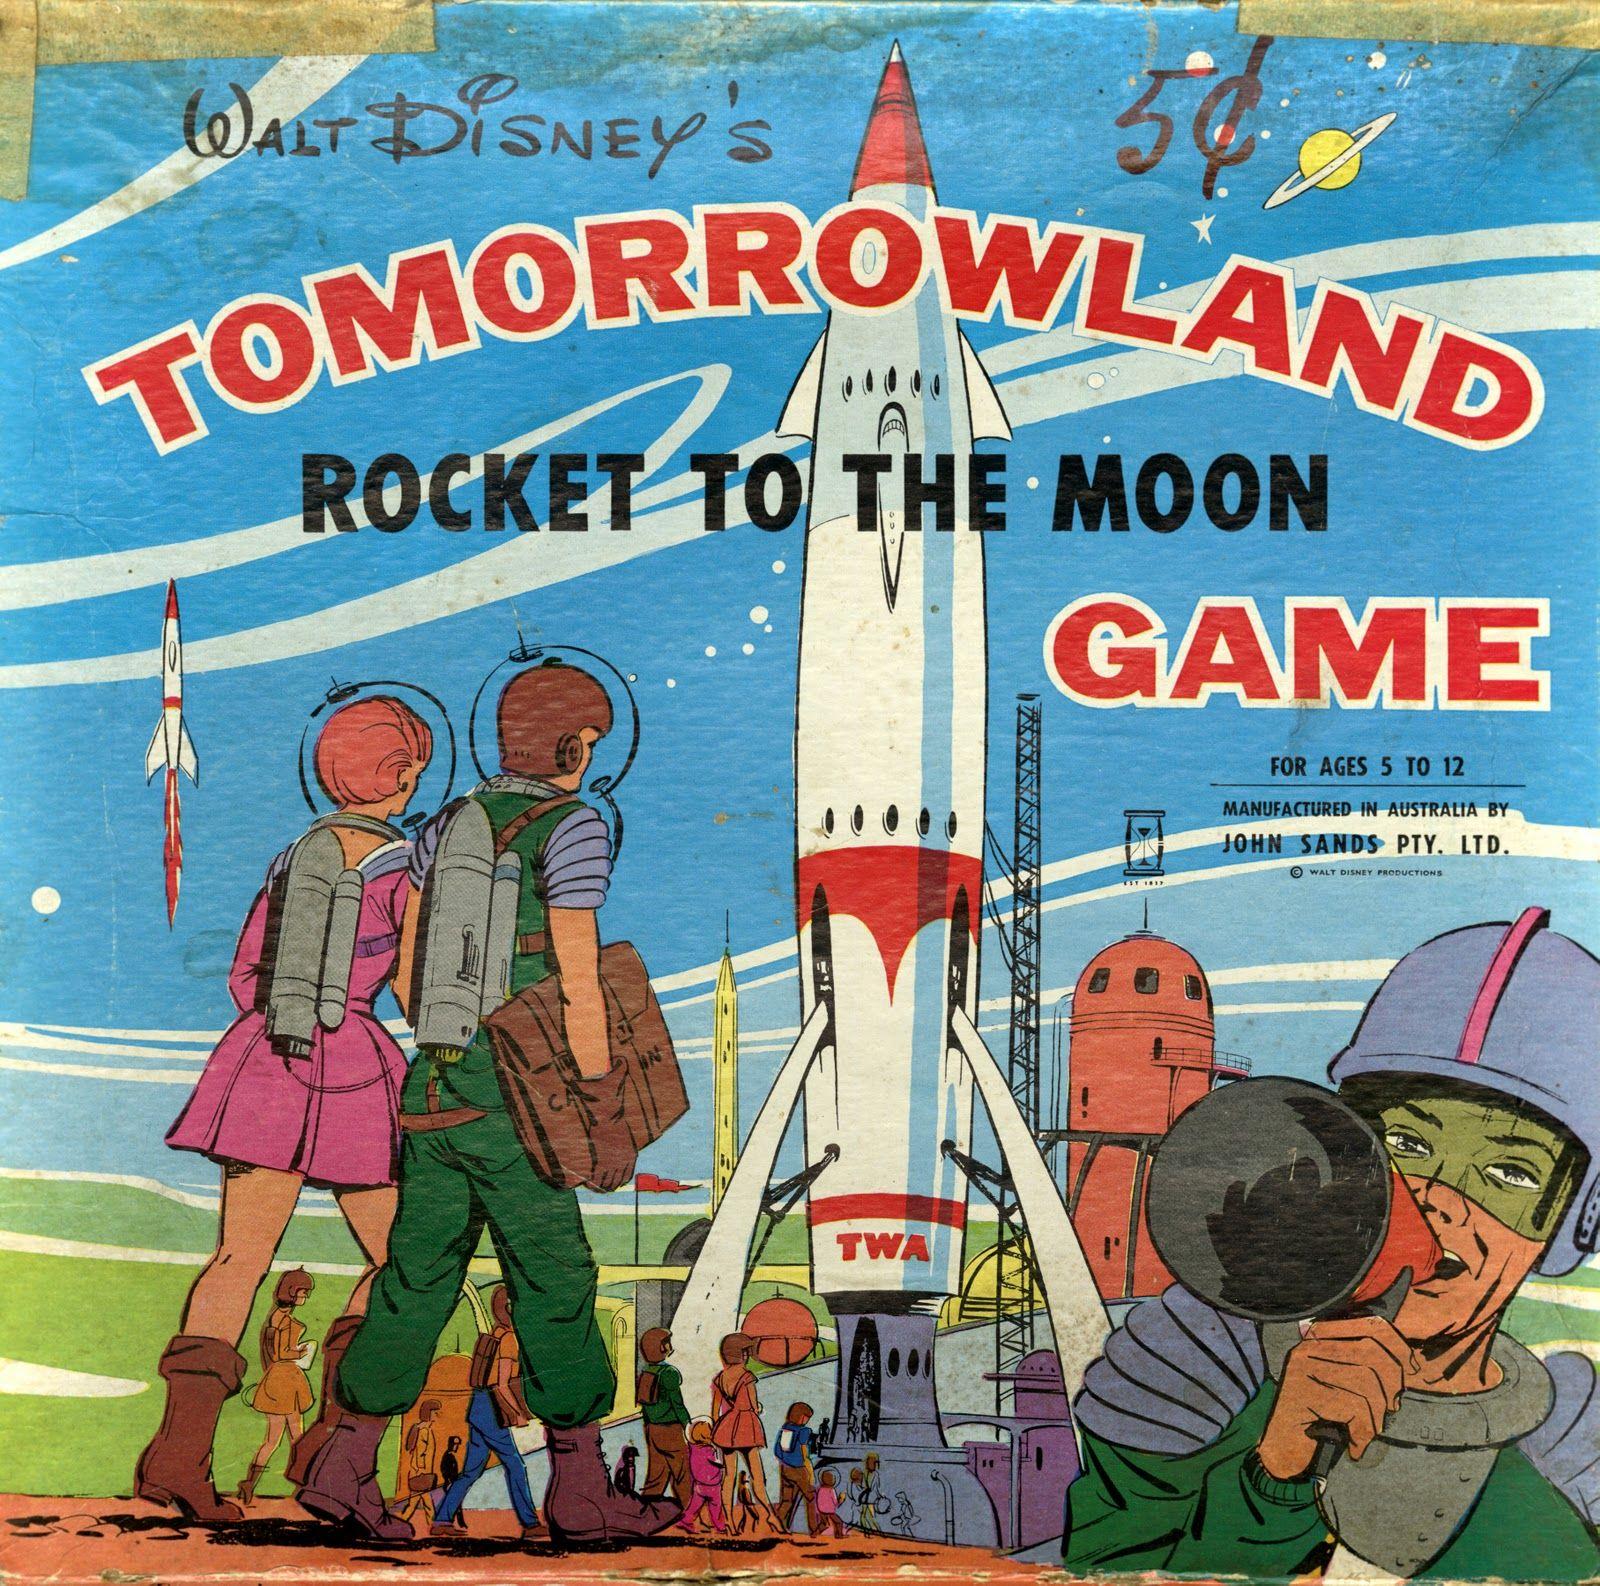 Walt Disney S Tomorrowland Rocket To The Moon Game Retro Disney Disney Games Vintage Disneyland